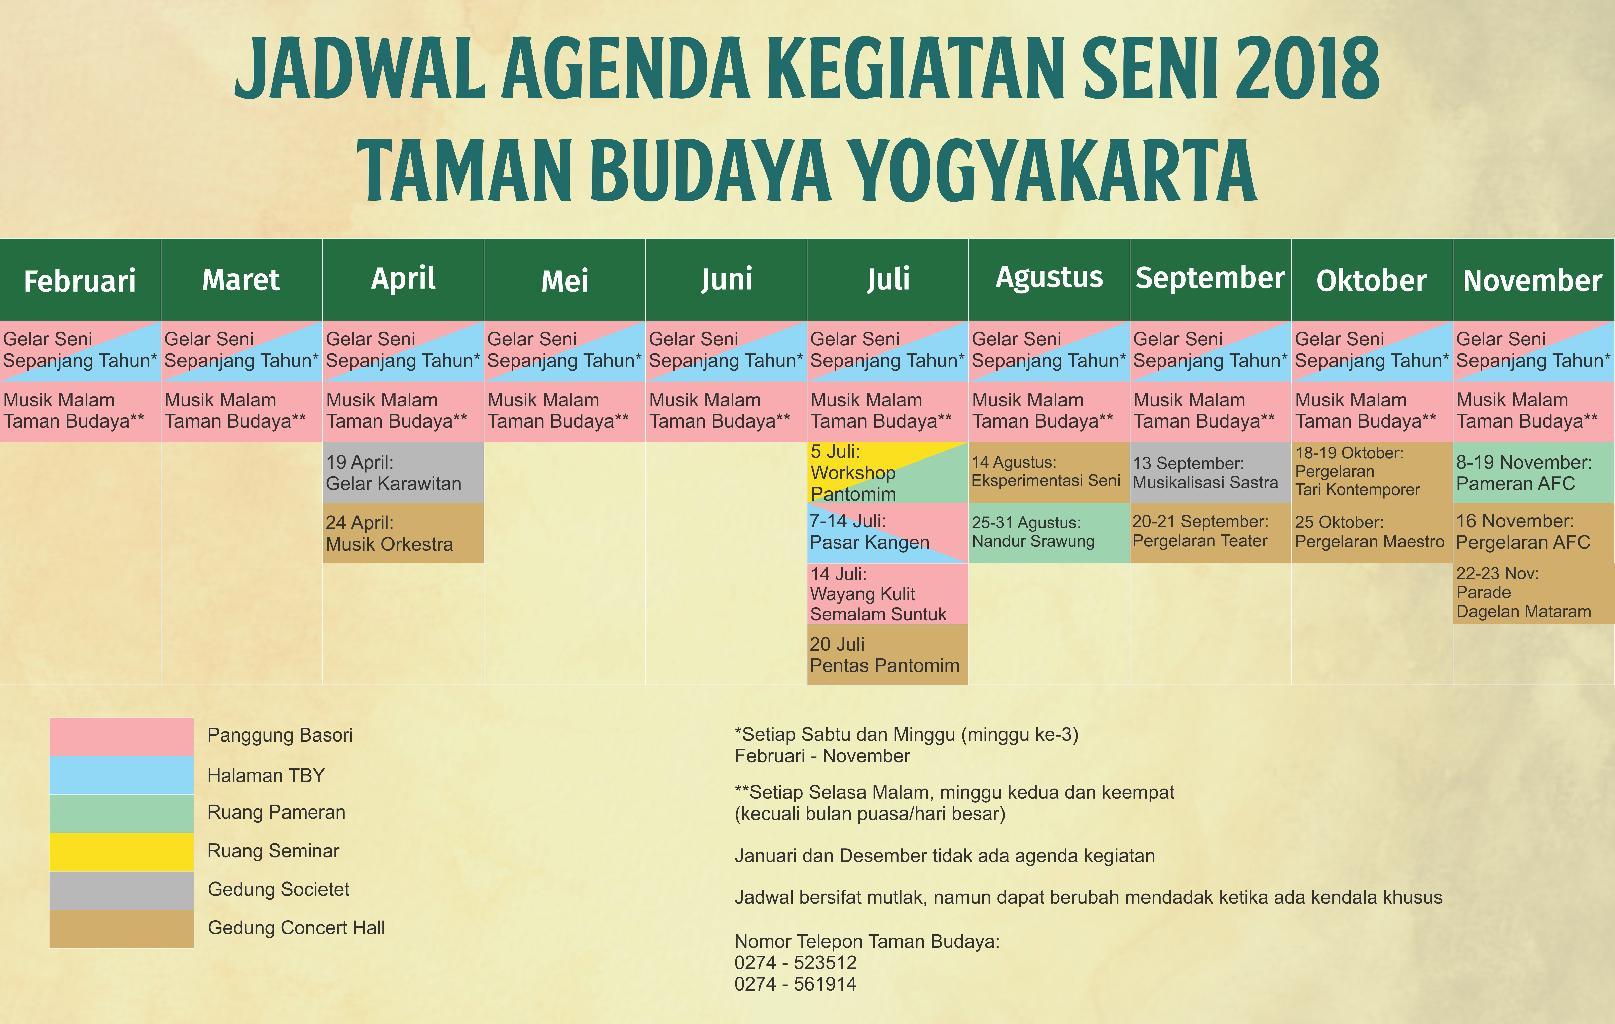 Warta TBY - Jadwal Agenda Kegiatan Seni Taman Budaya Yogyakarta